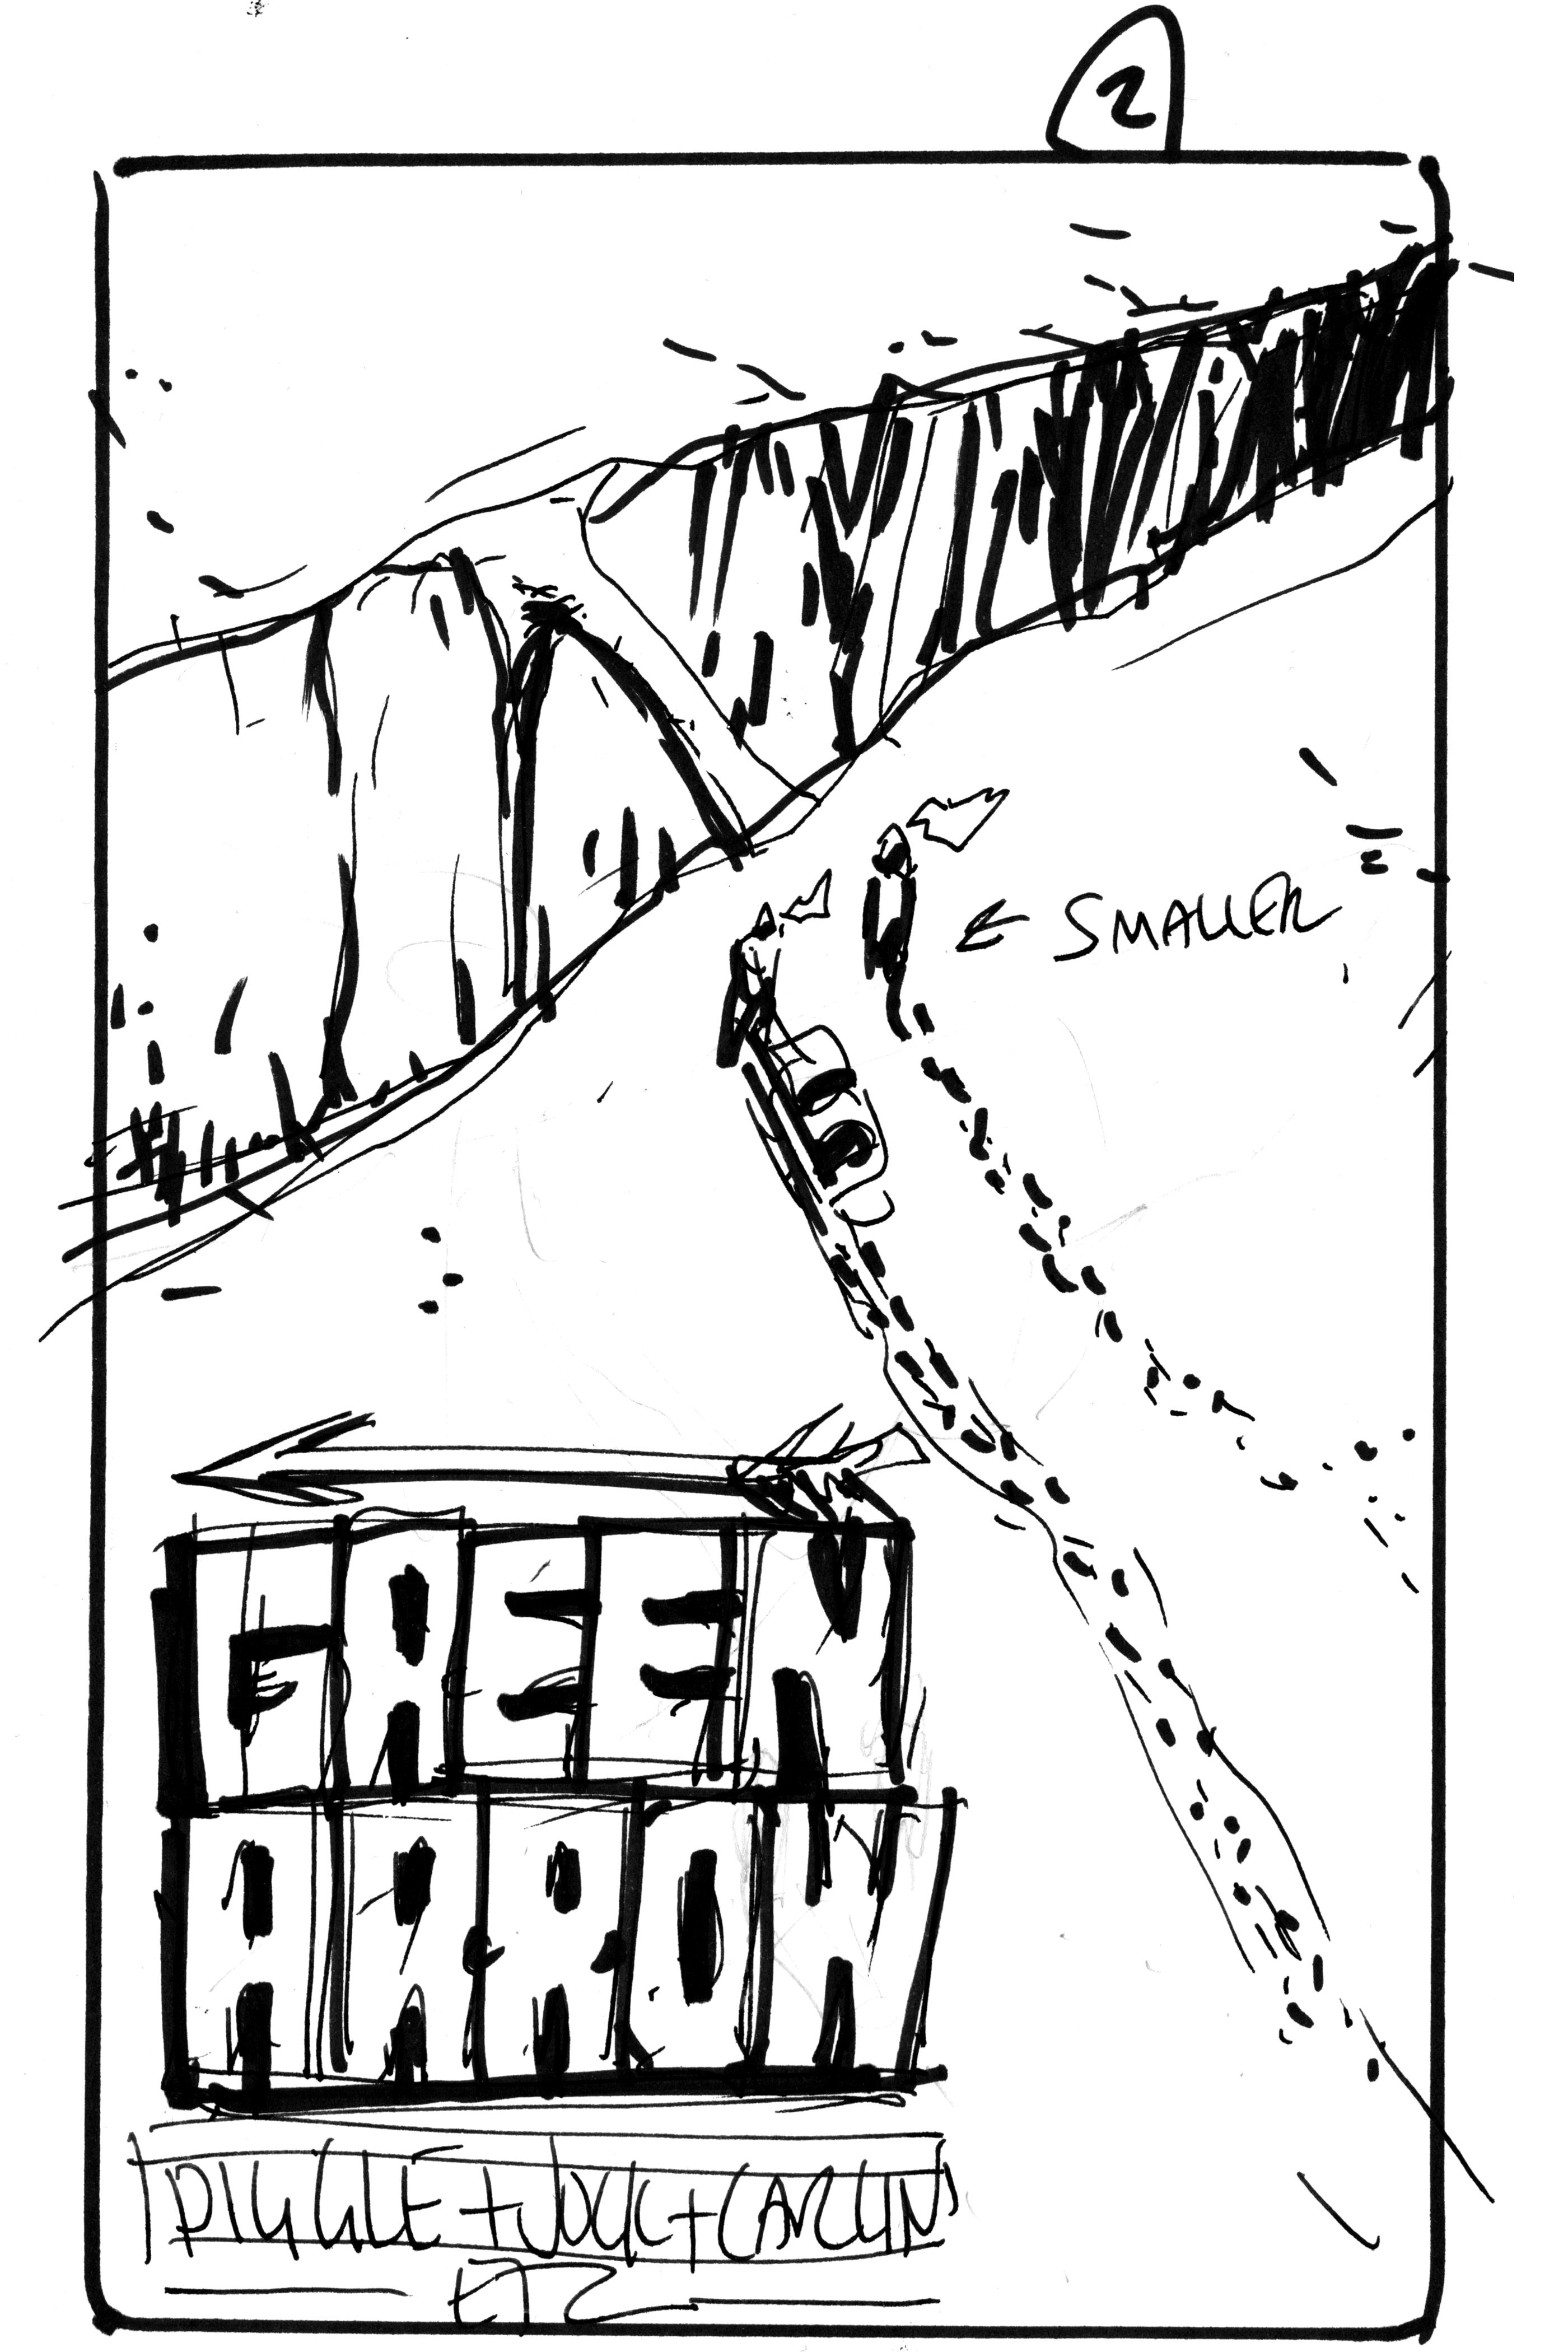 http://www.urban-comics.com/wp-content/uploads/2013/10/pp2.jpg